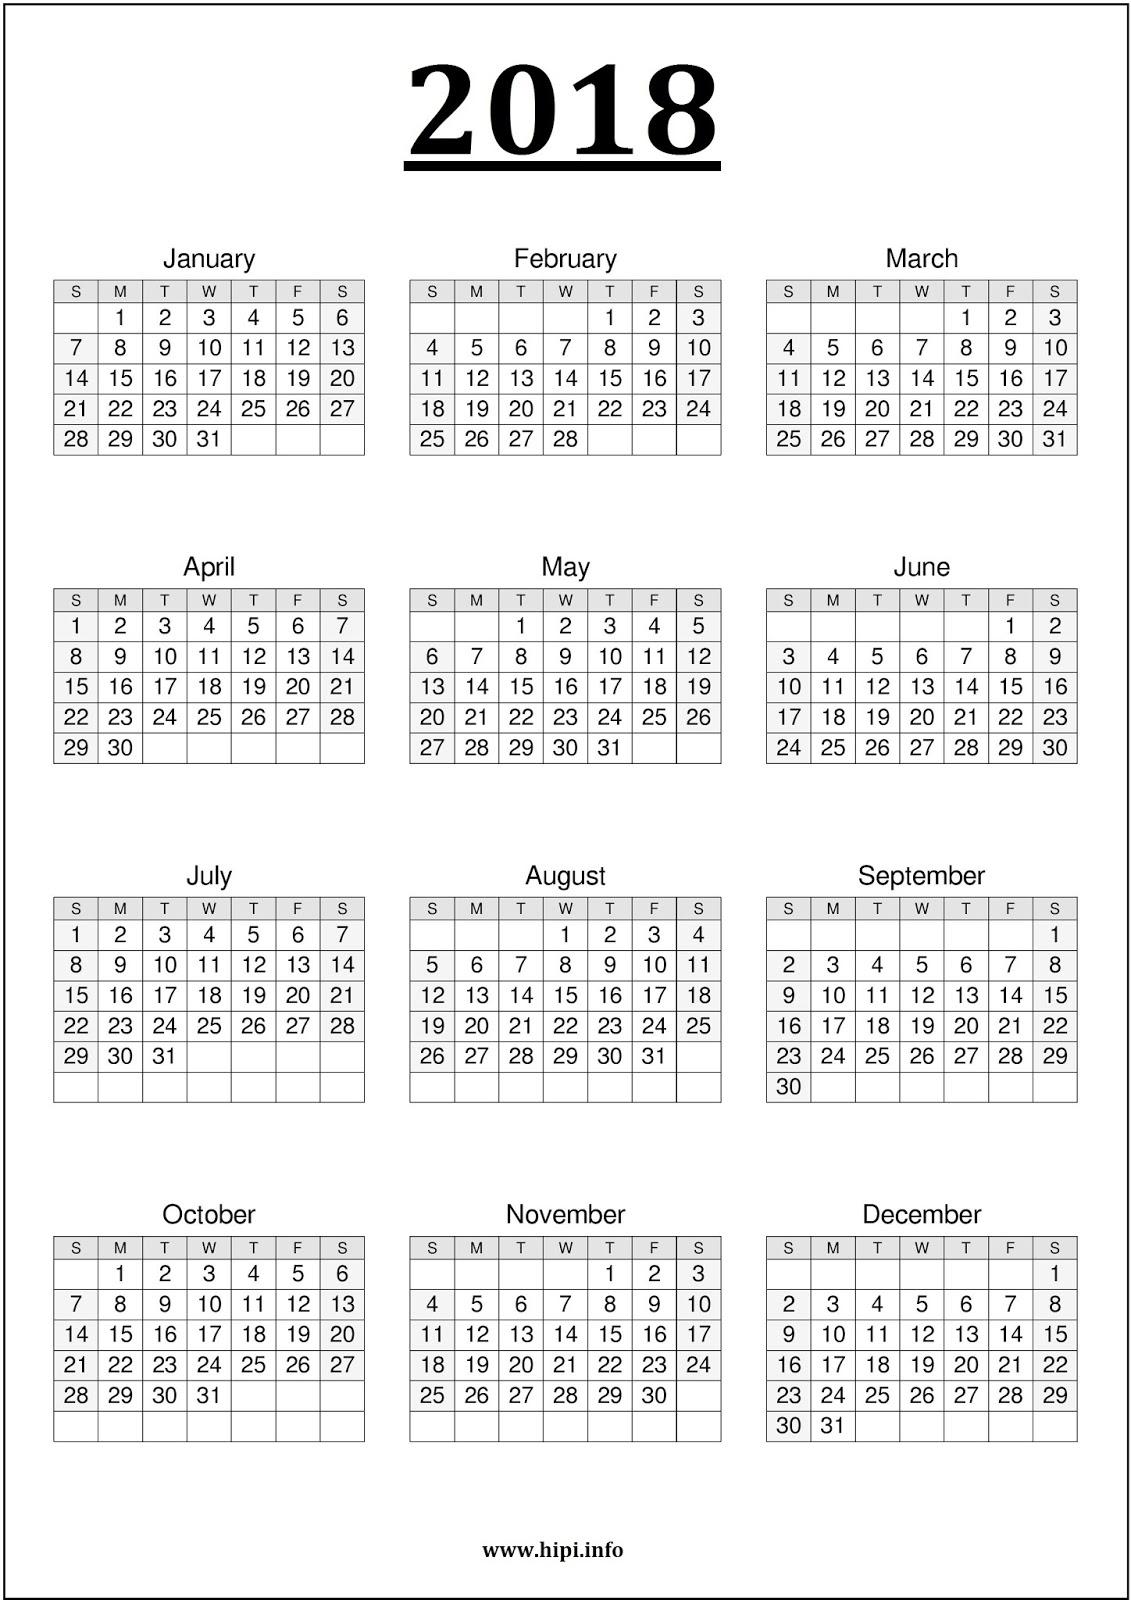 2018 calendar printable one page - Geocvc.co